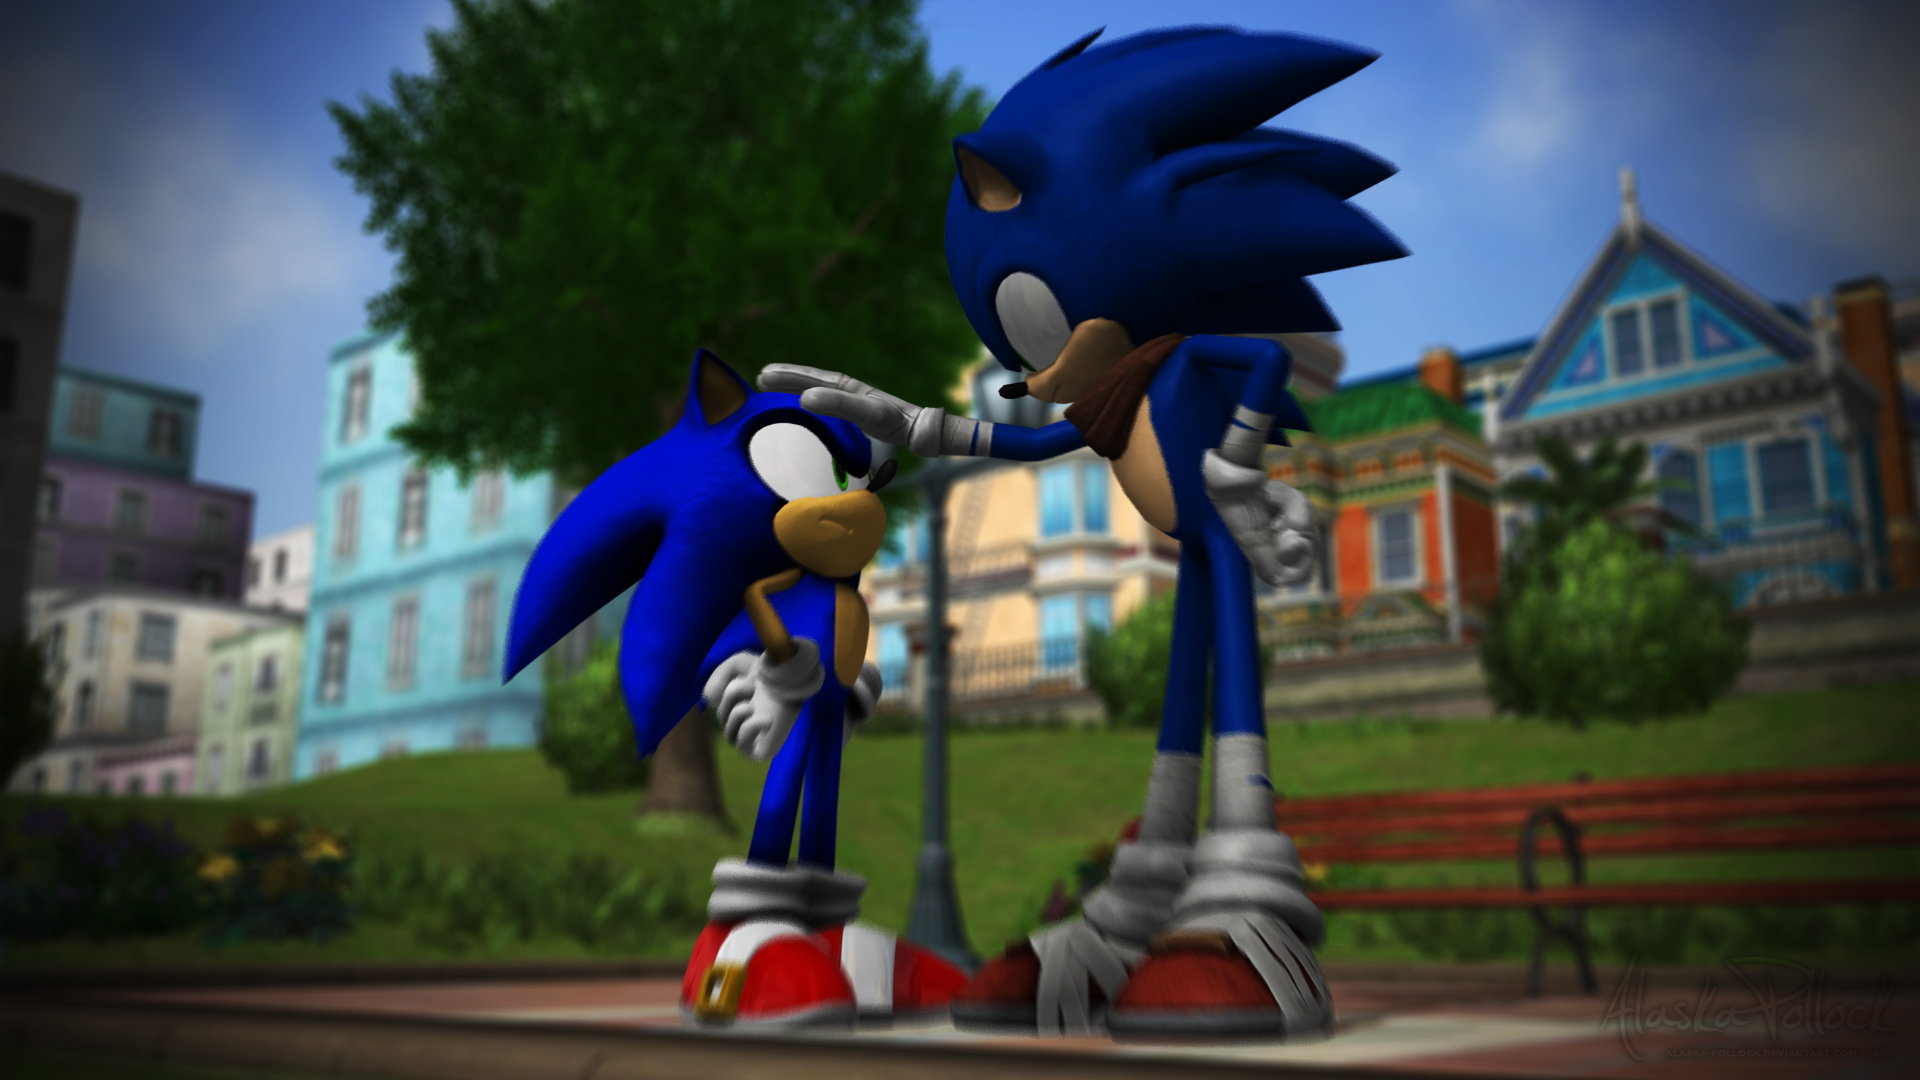 Request Sonic The Hedgehog Modern Meets Boom By Alaska Pollock On Deviantart